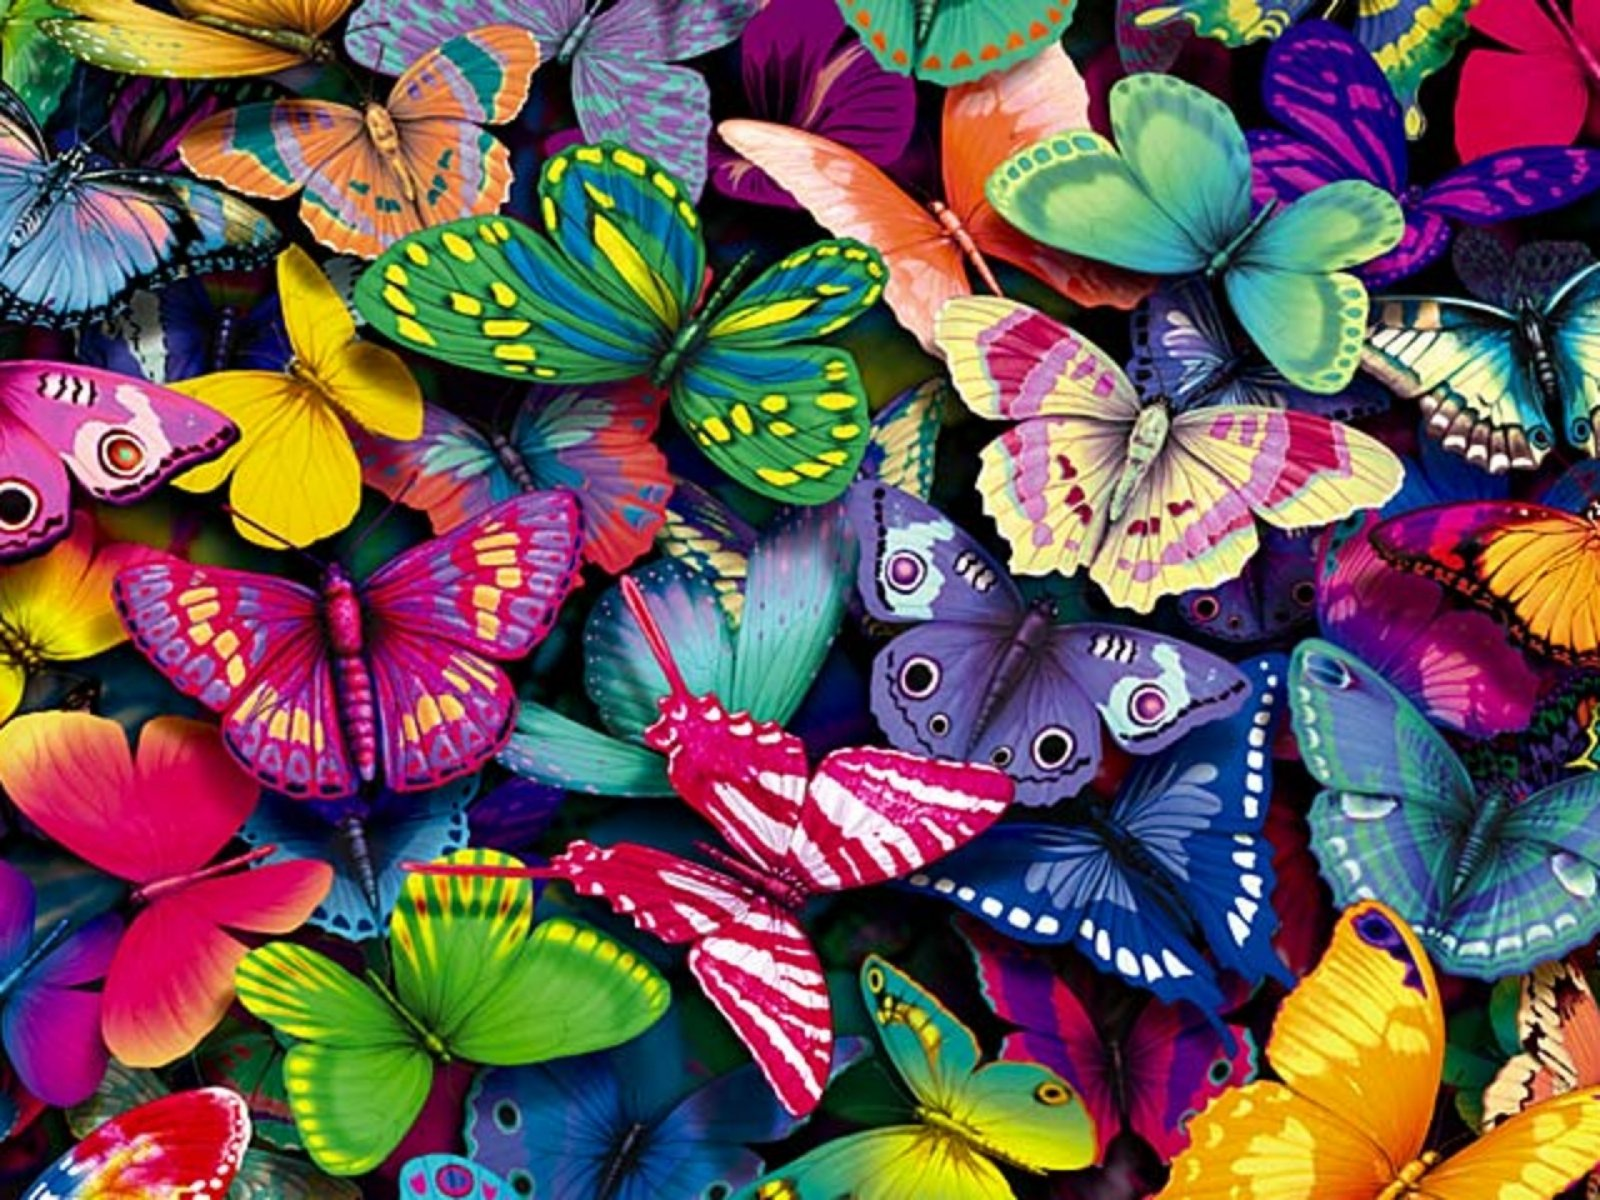 Desktop wallpaper 96 for Immagini farfalle per desktop